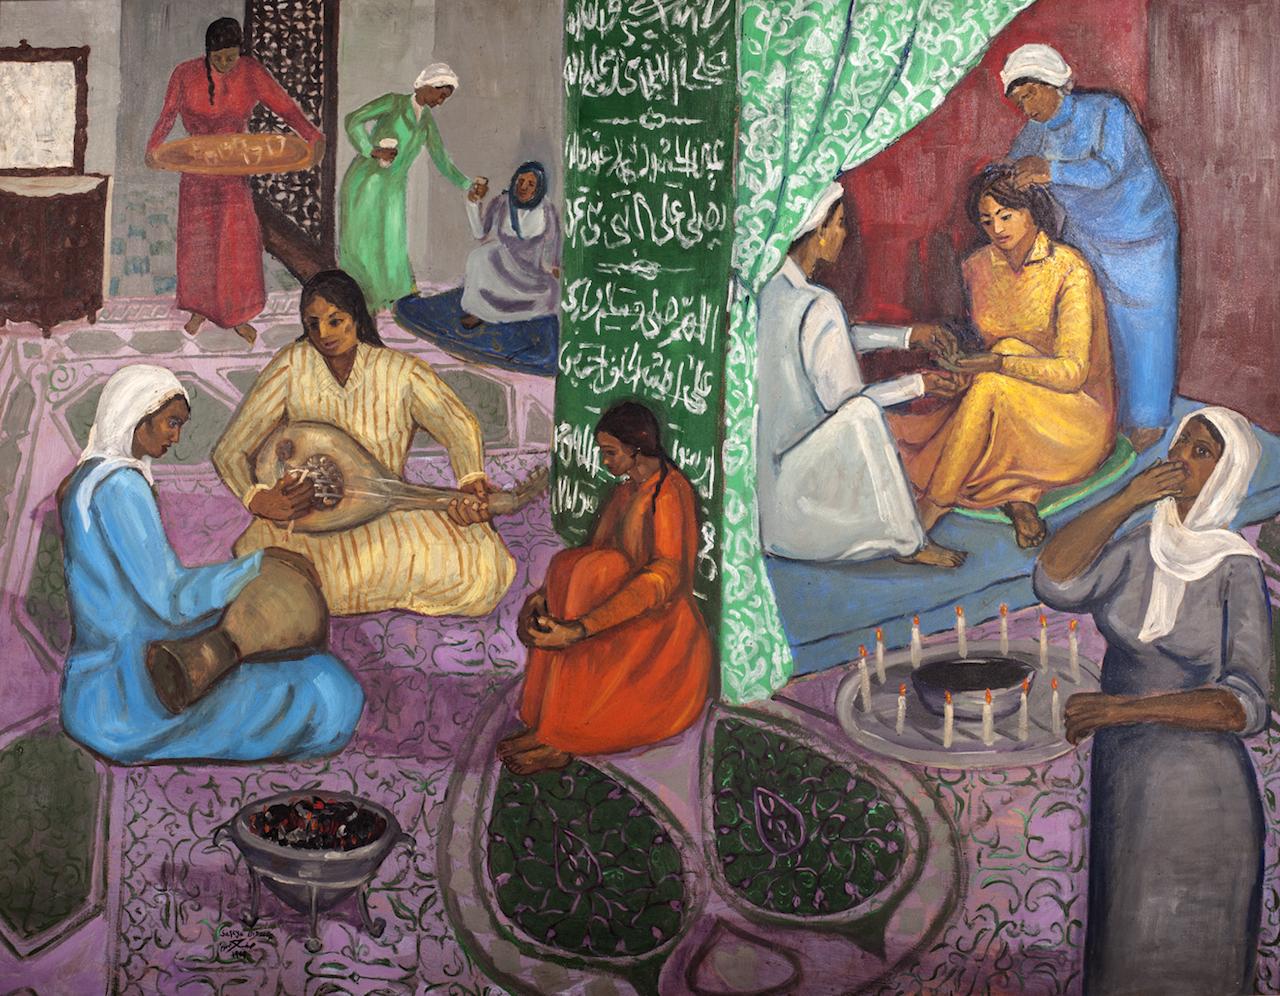 Safeya bin Zager, Al Henna, 1969, Oil on Canvas, 95 x 123 cm